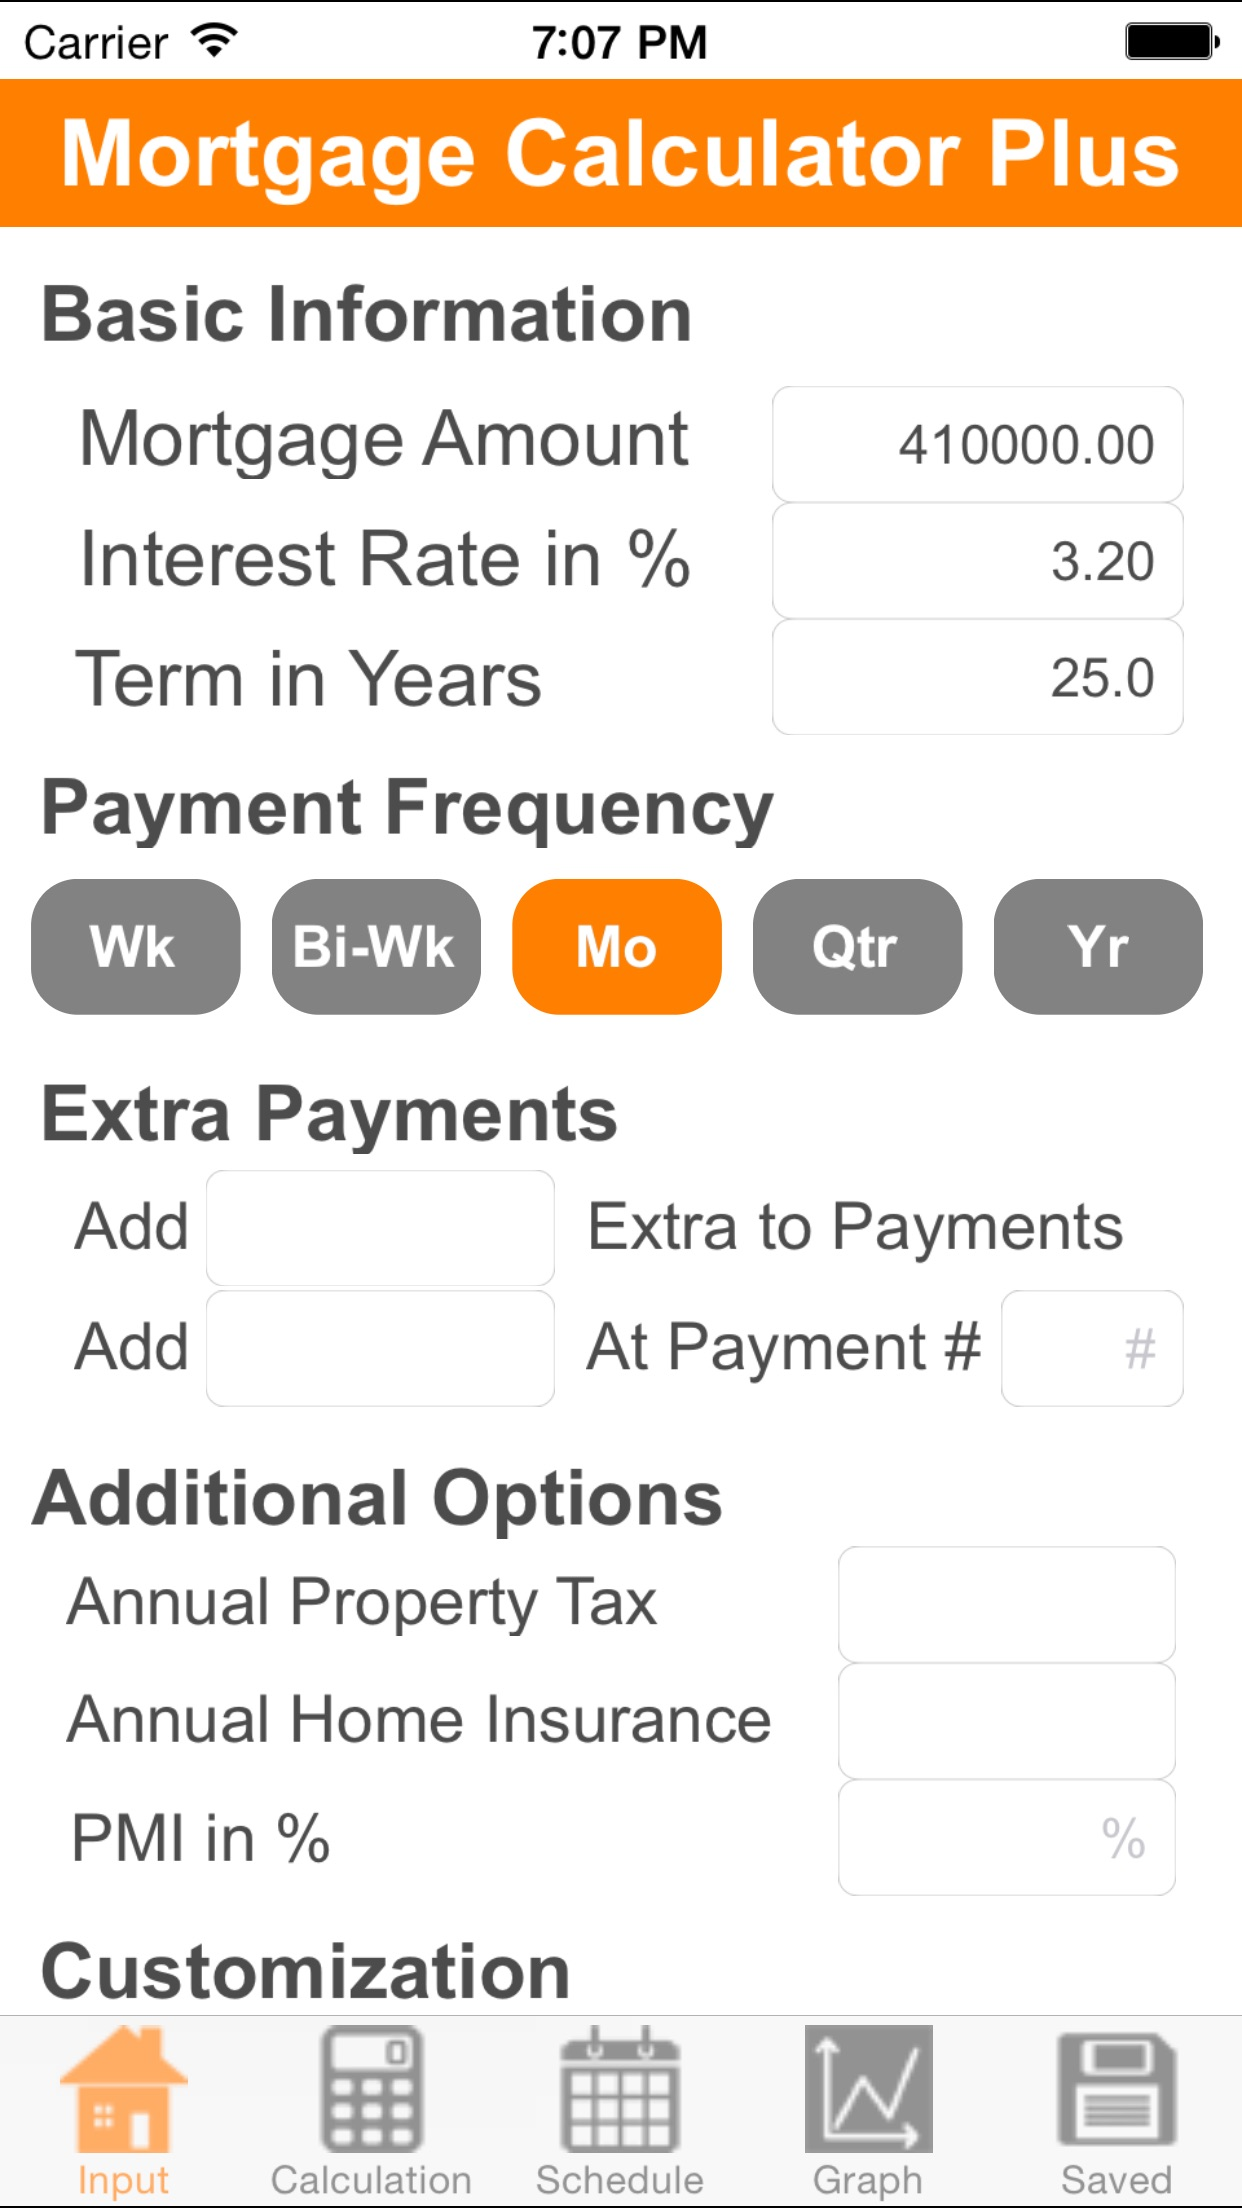 Mortgage Calculator Plus Screenshot